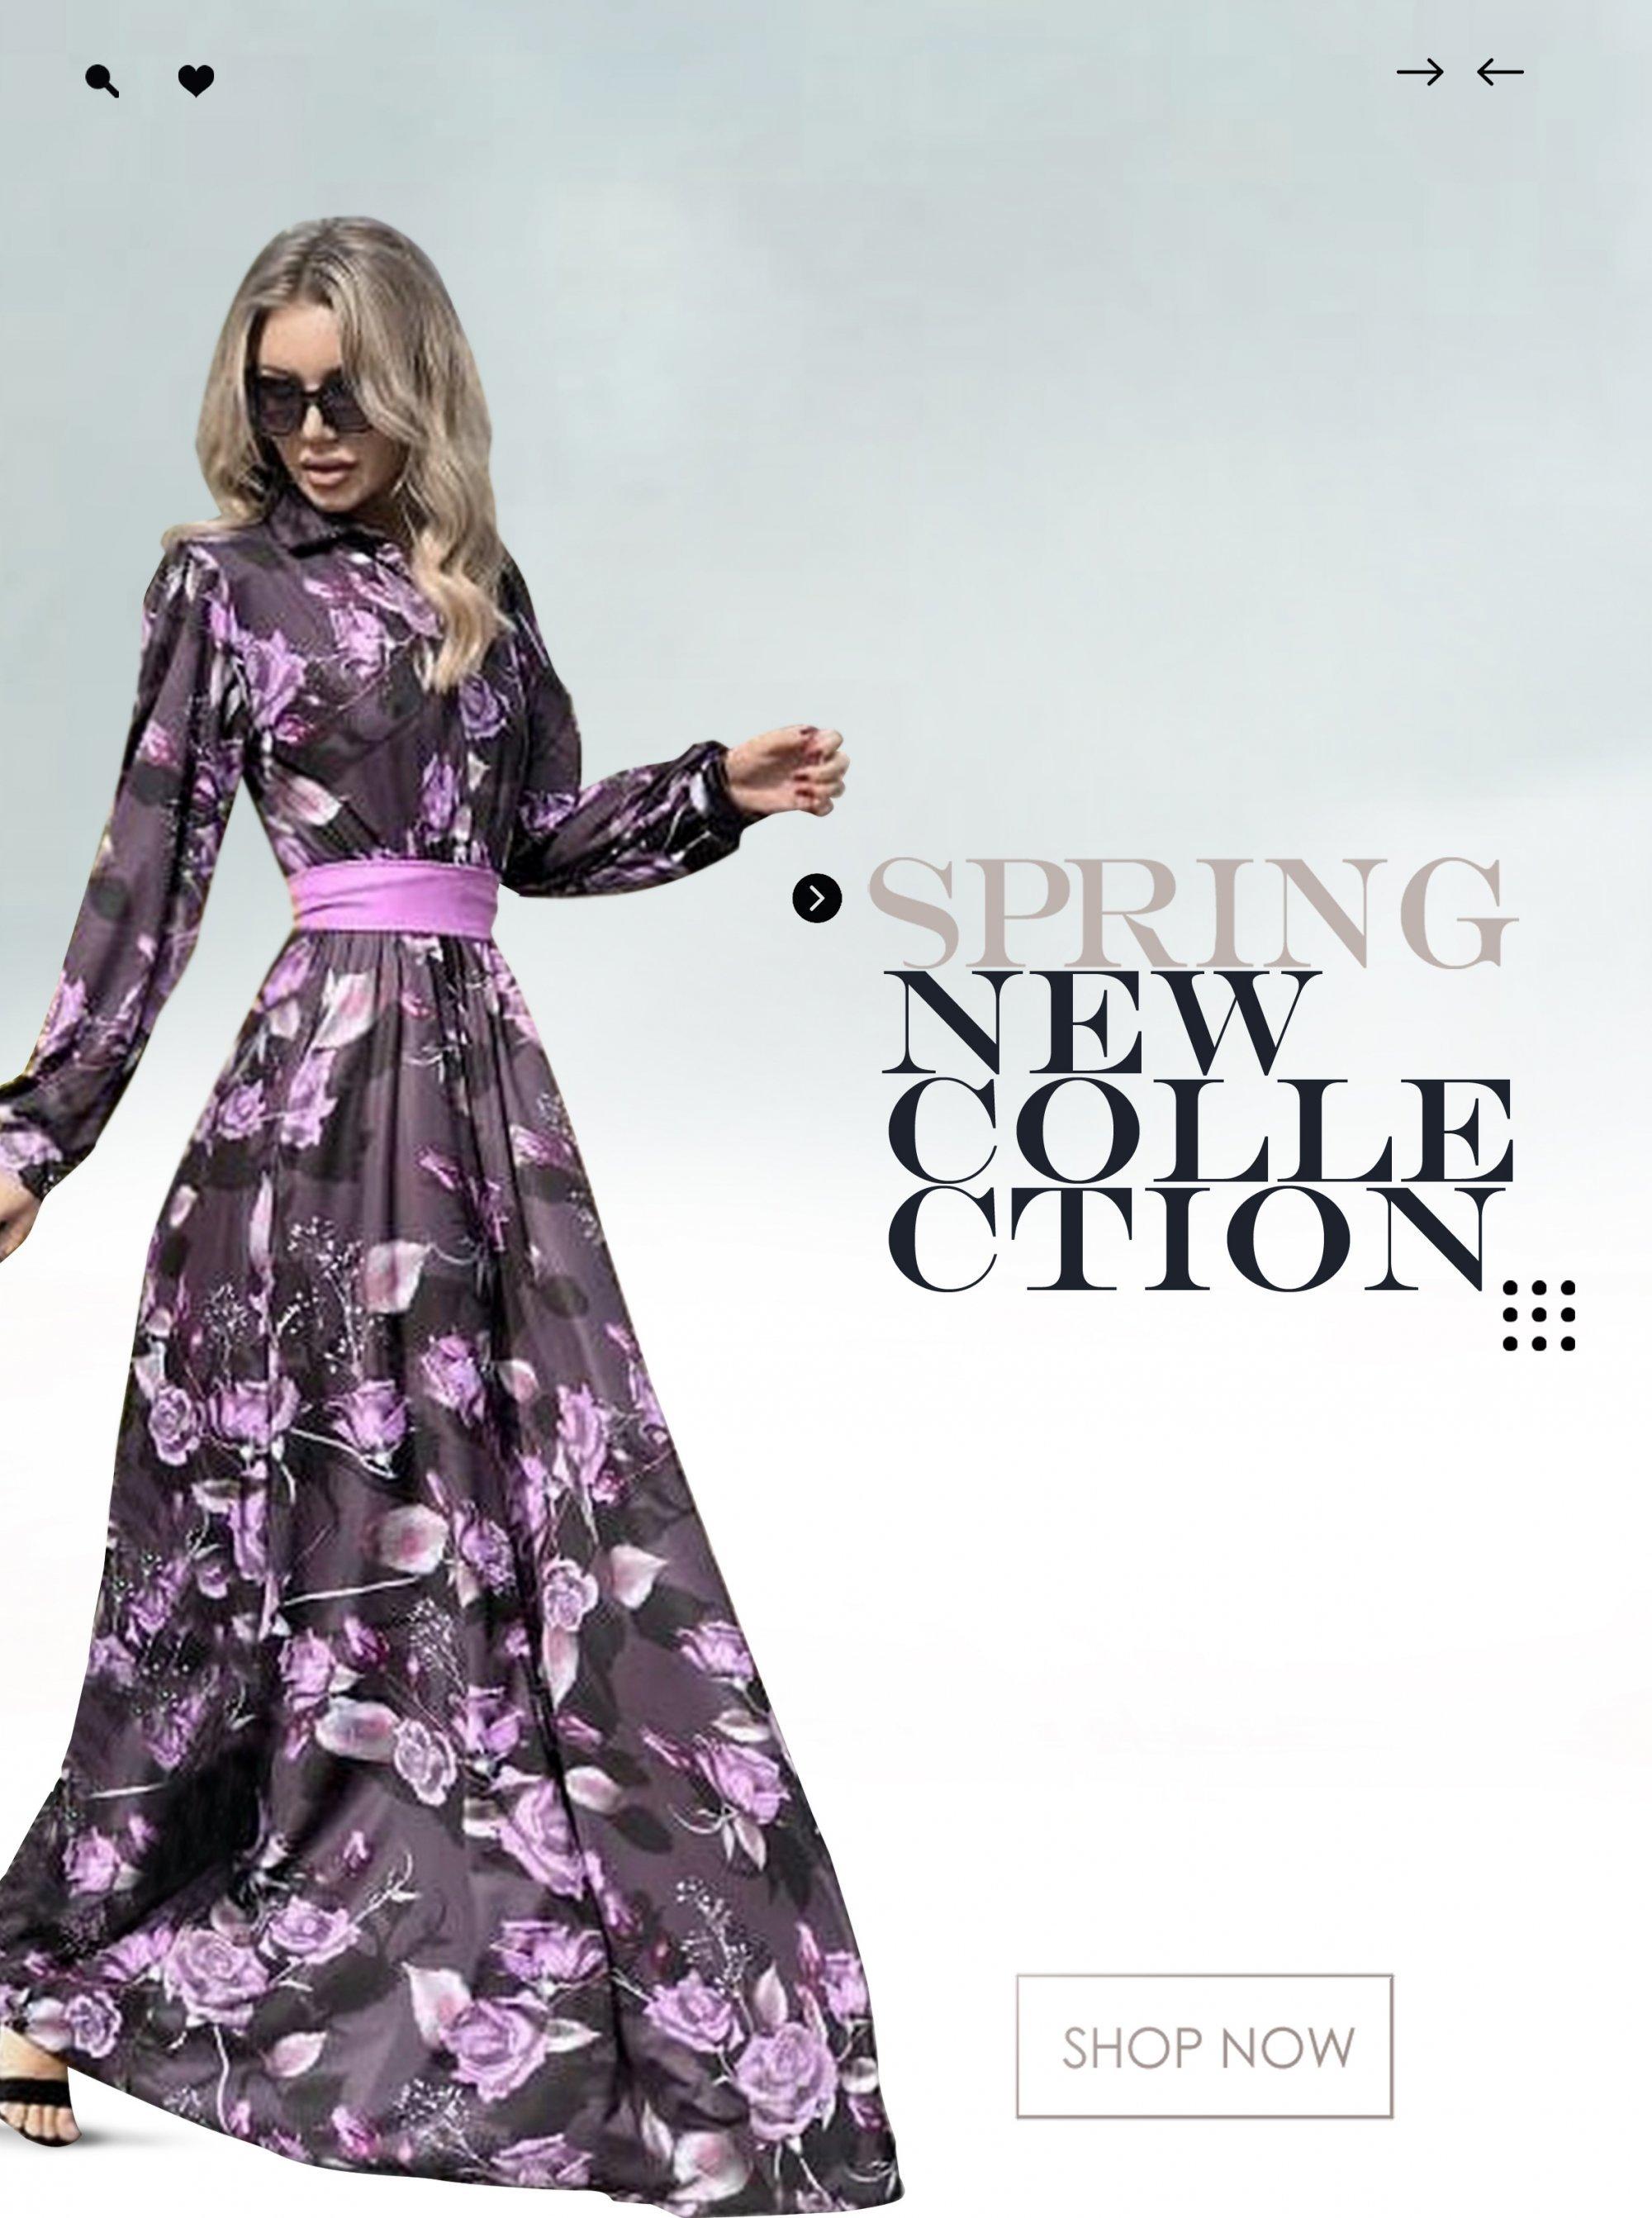 c0d516d5bb0d Μοντέρνα γυναικεία ρούχα Online